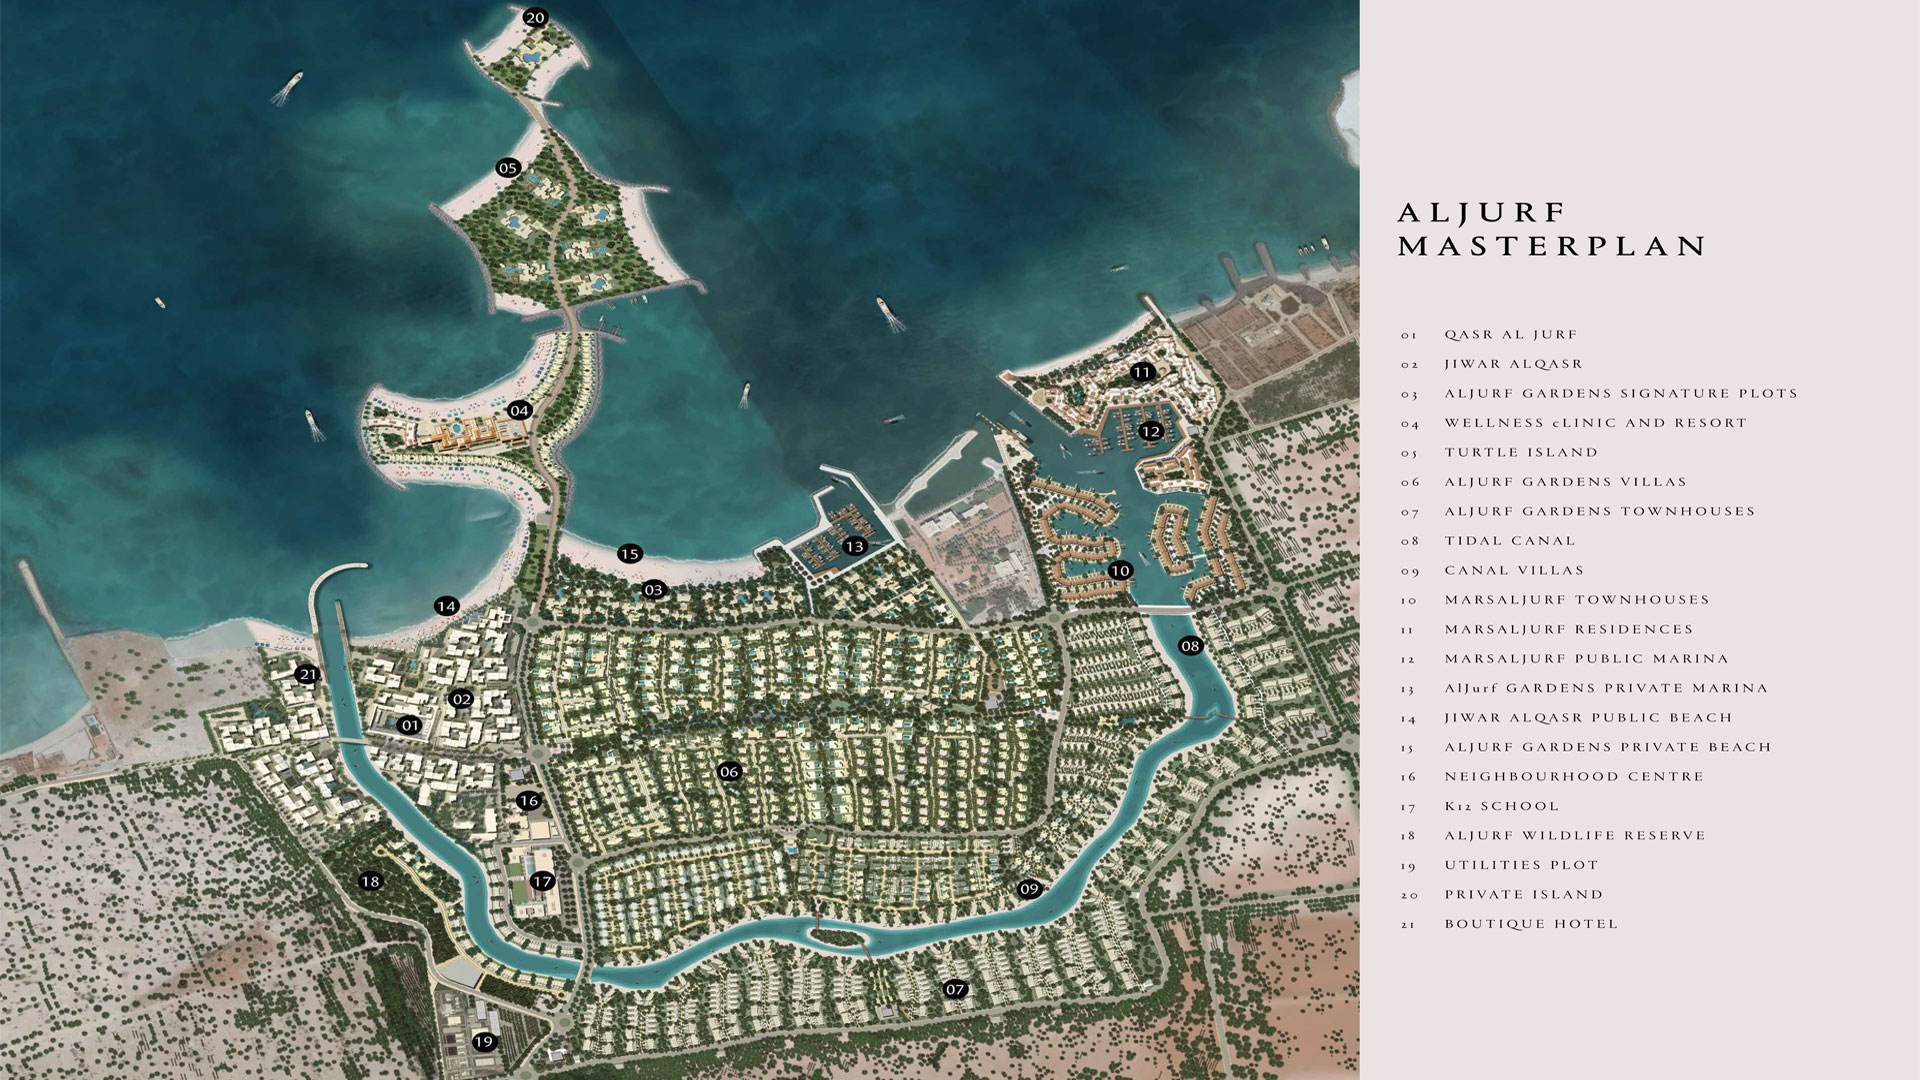 AlJurf-Badya-Villas Master Plan